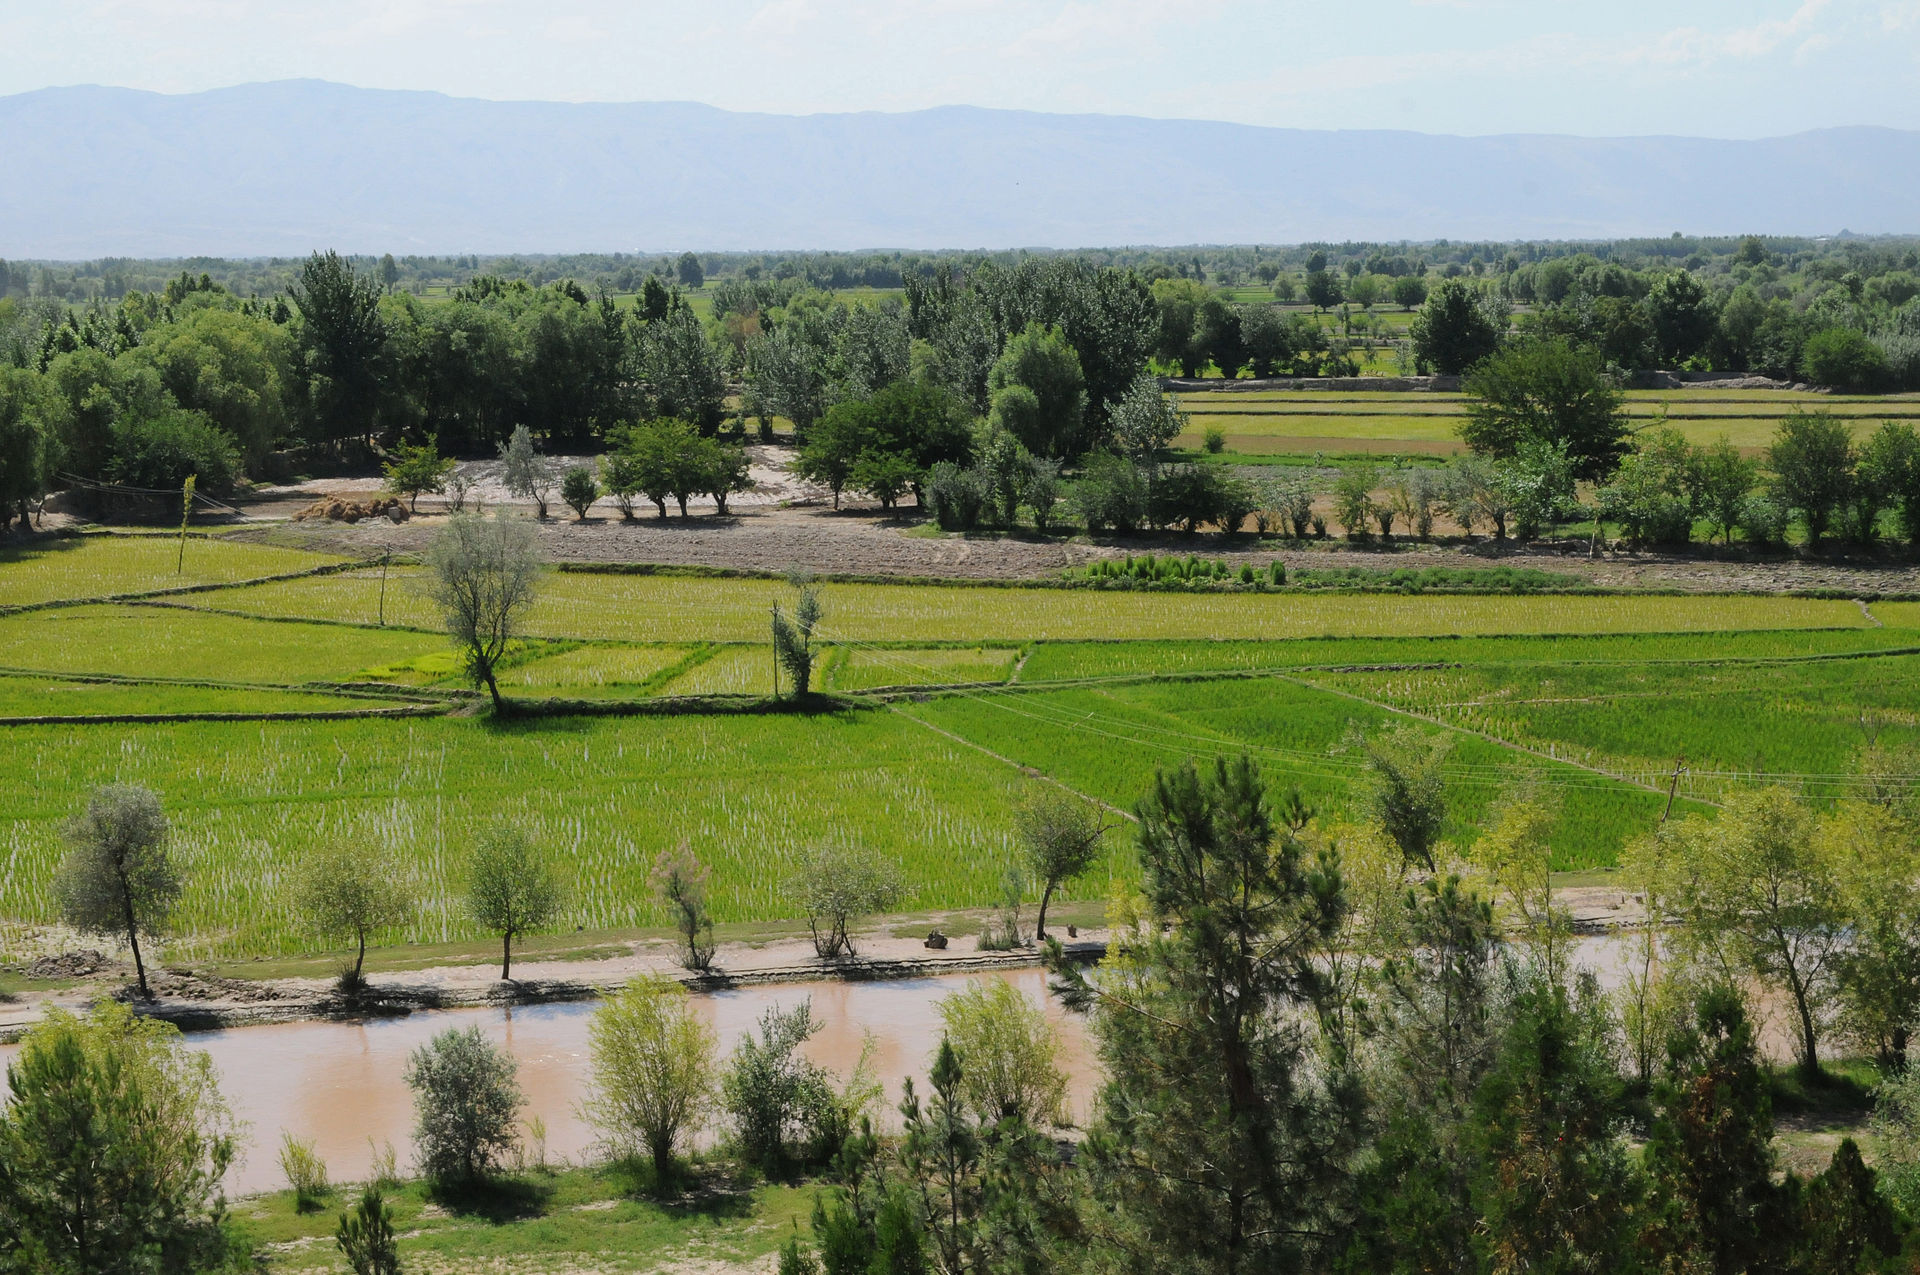 Hillside_view_in_Khawajah_Bahawuddin,_Takhar_Province,_Afghanistan.jpg